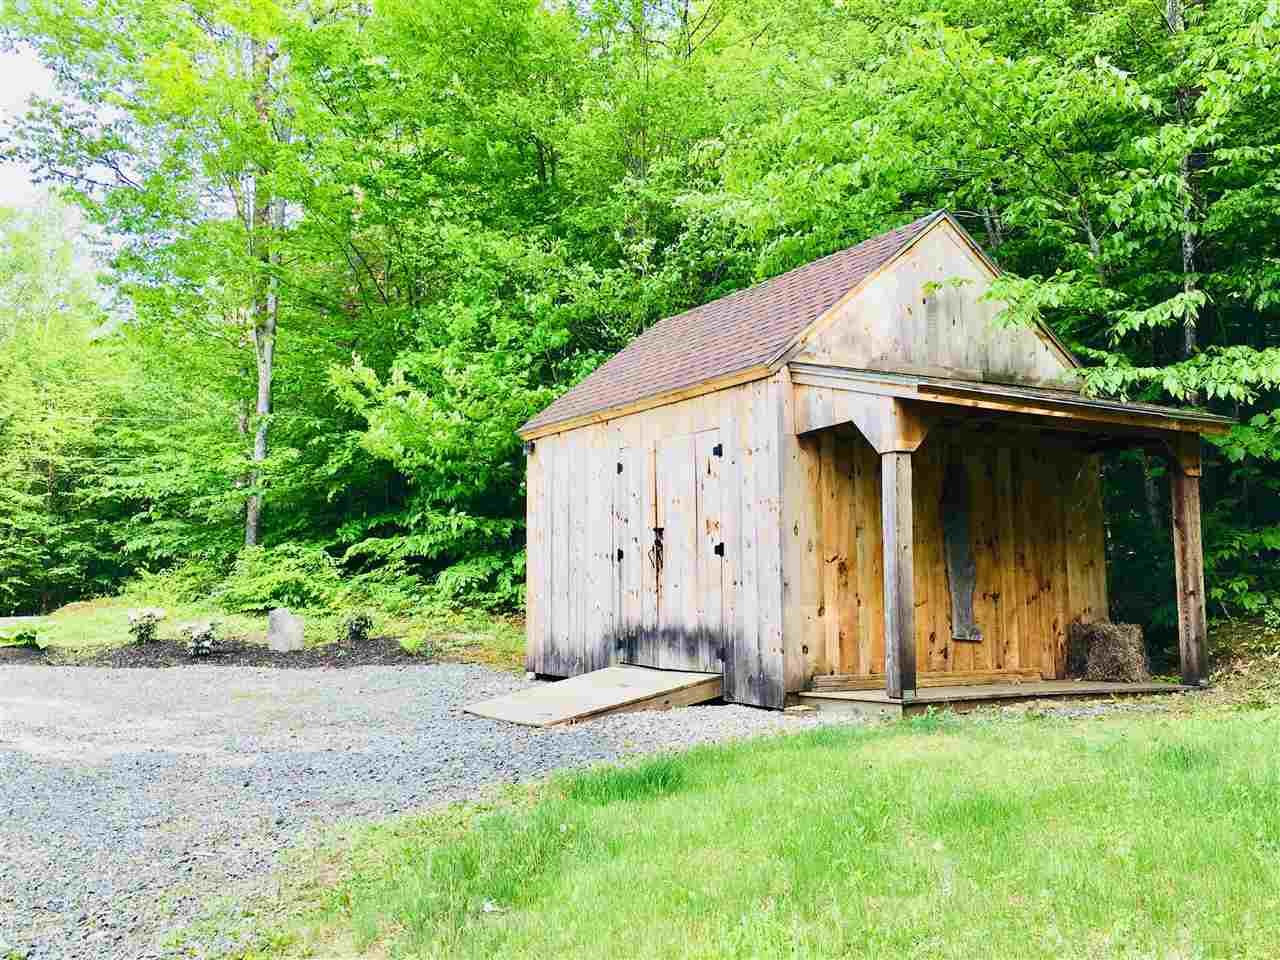 garden shed 12036426